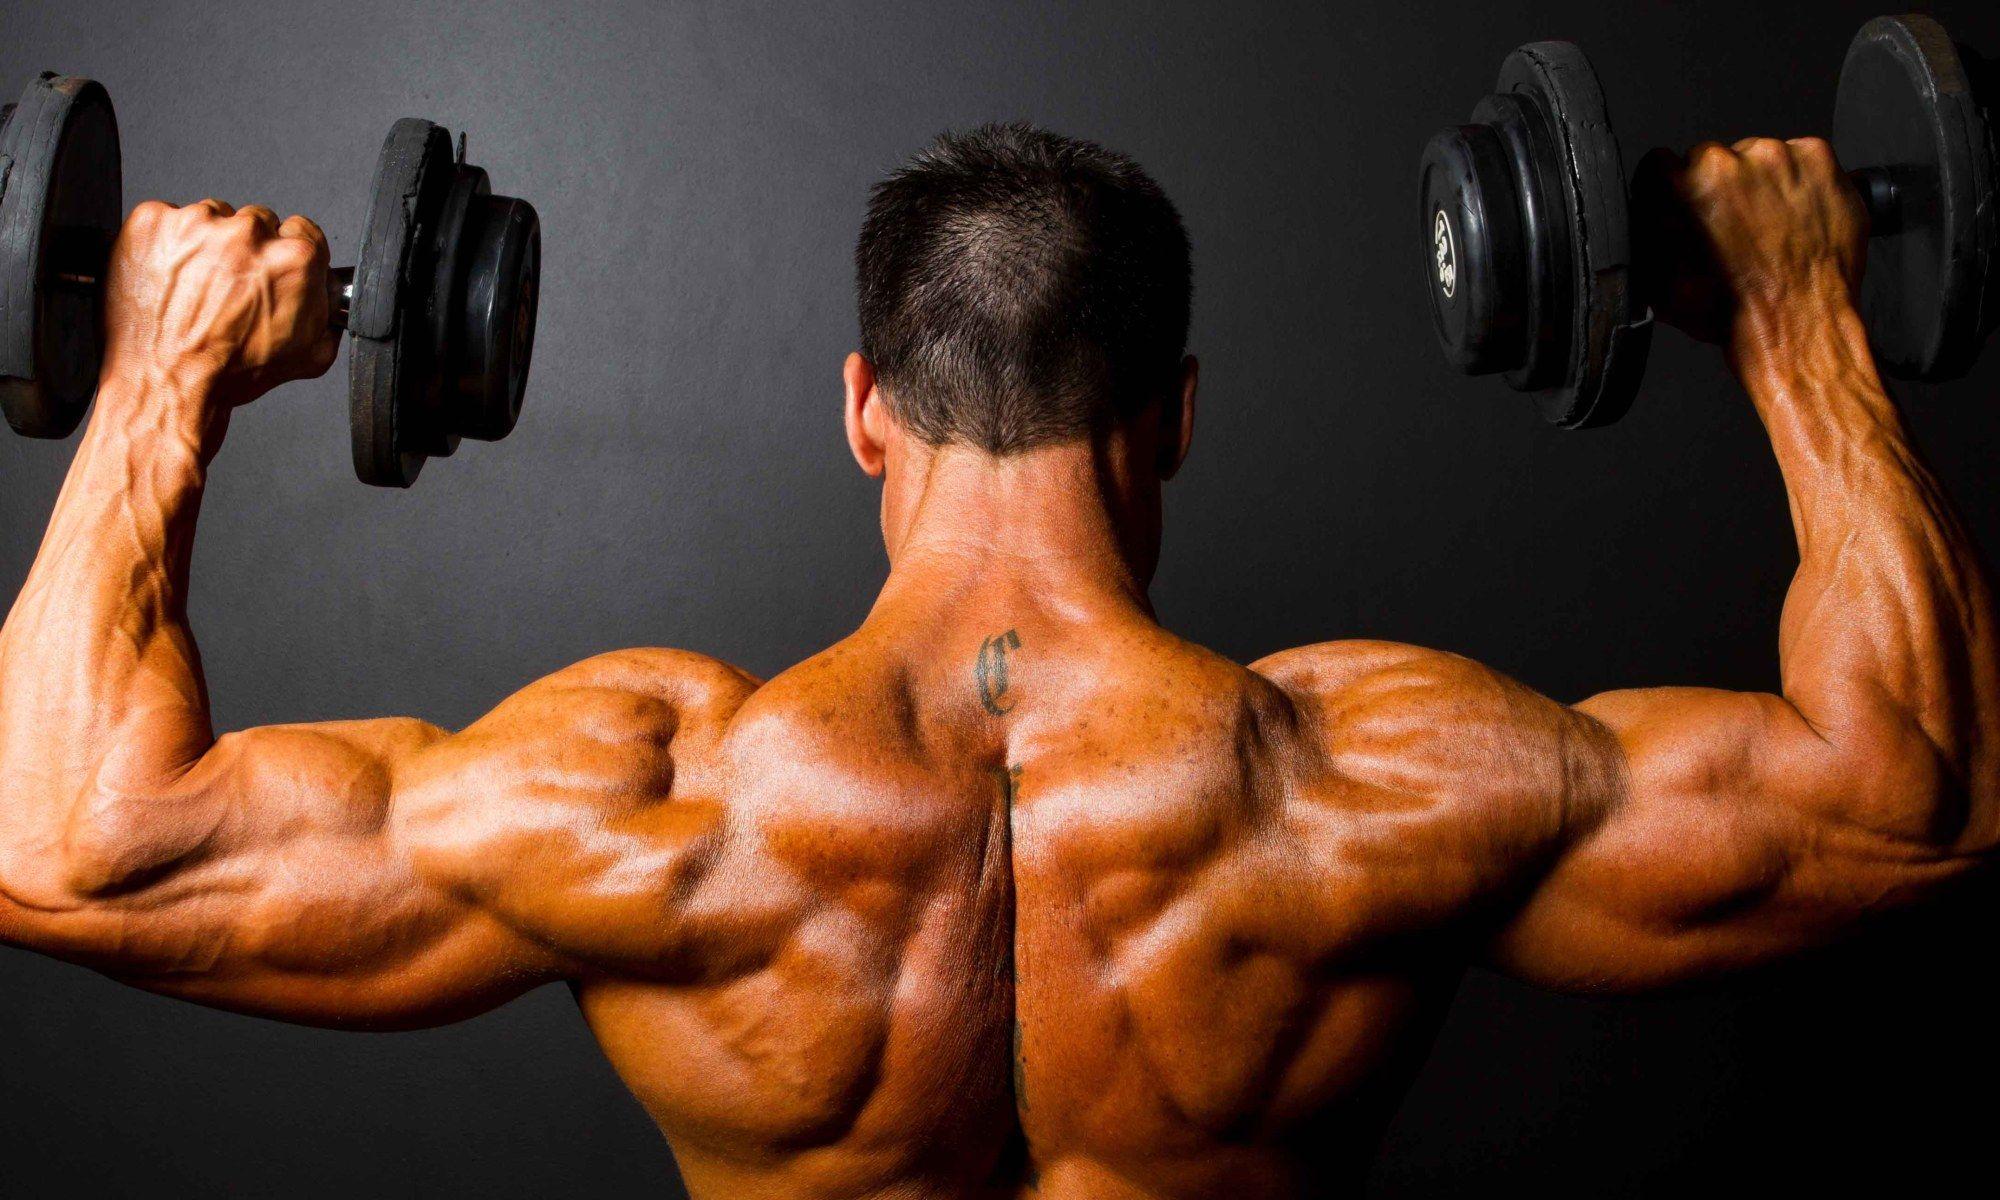 will dieting weaken muscles